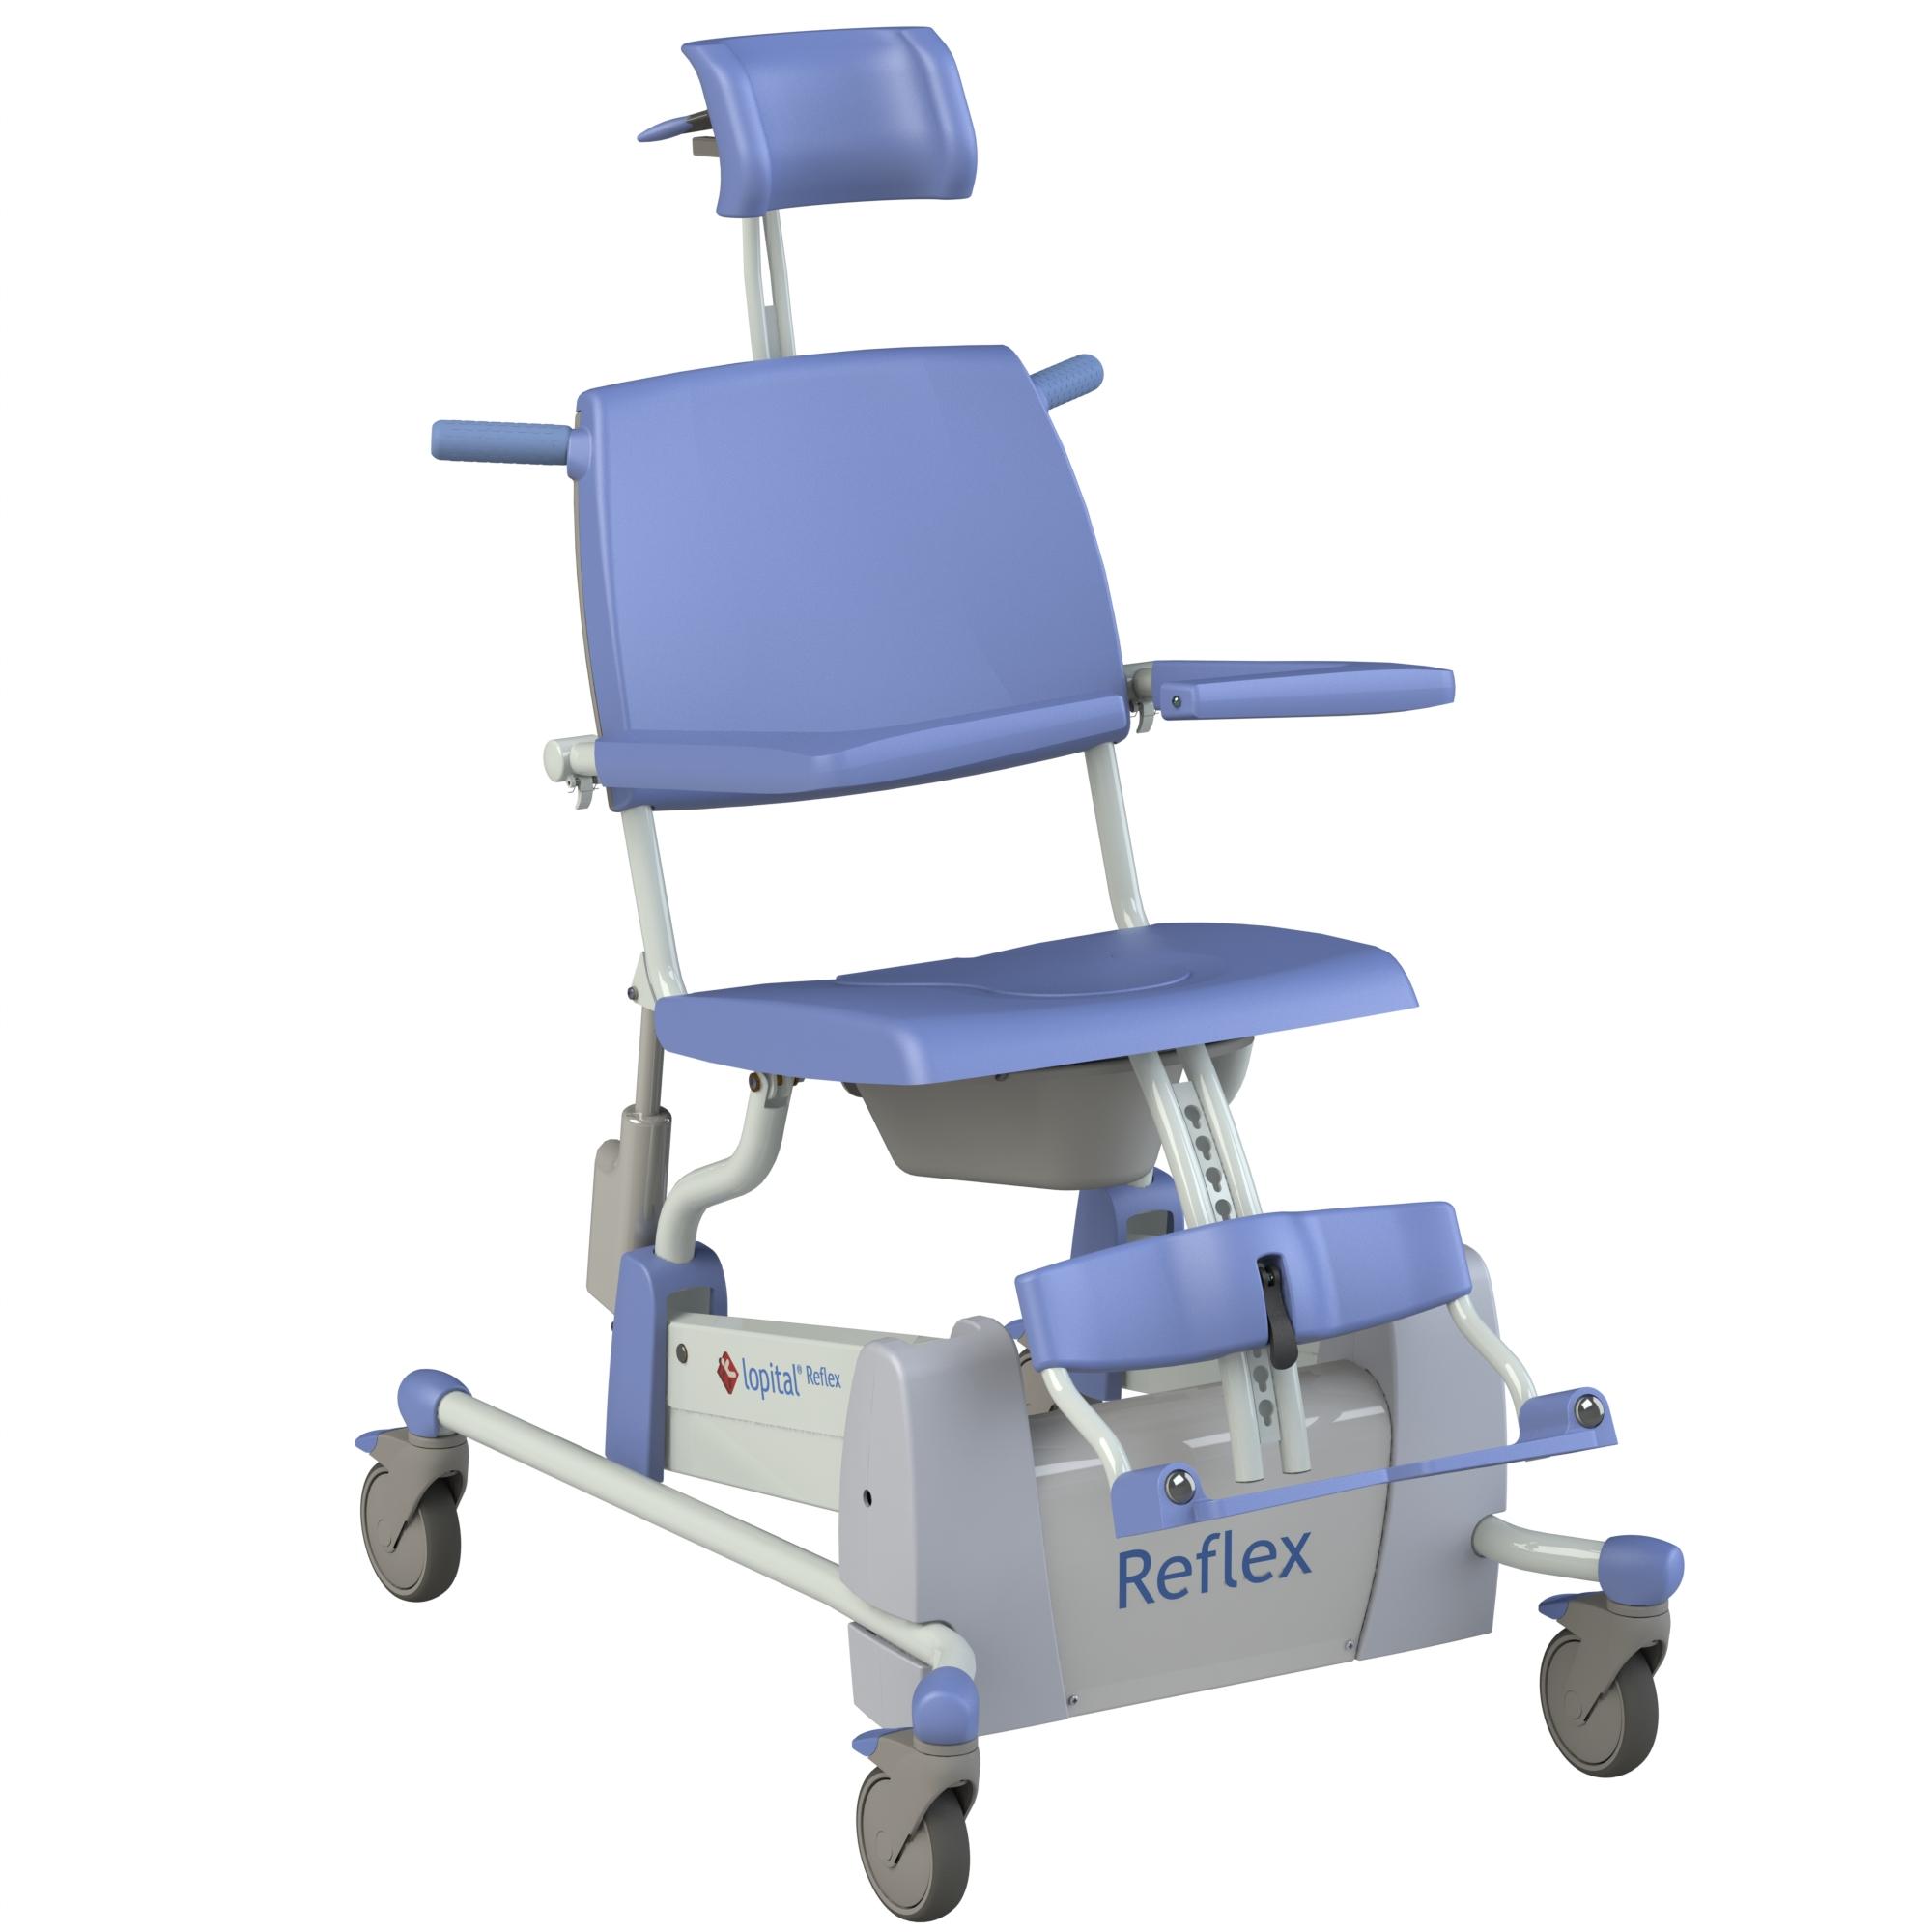 Reflex Shower and Toilet Chair Caretua Ltd